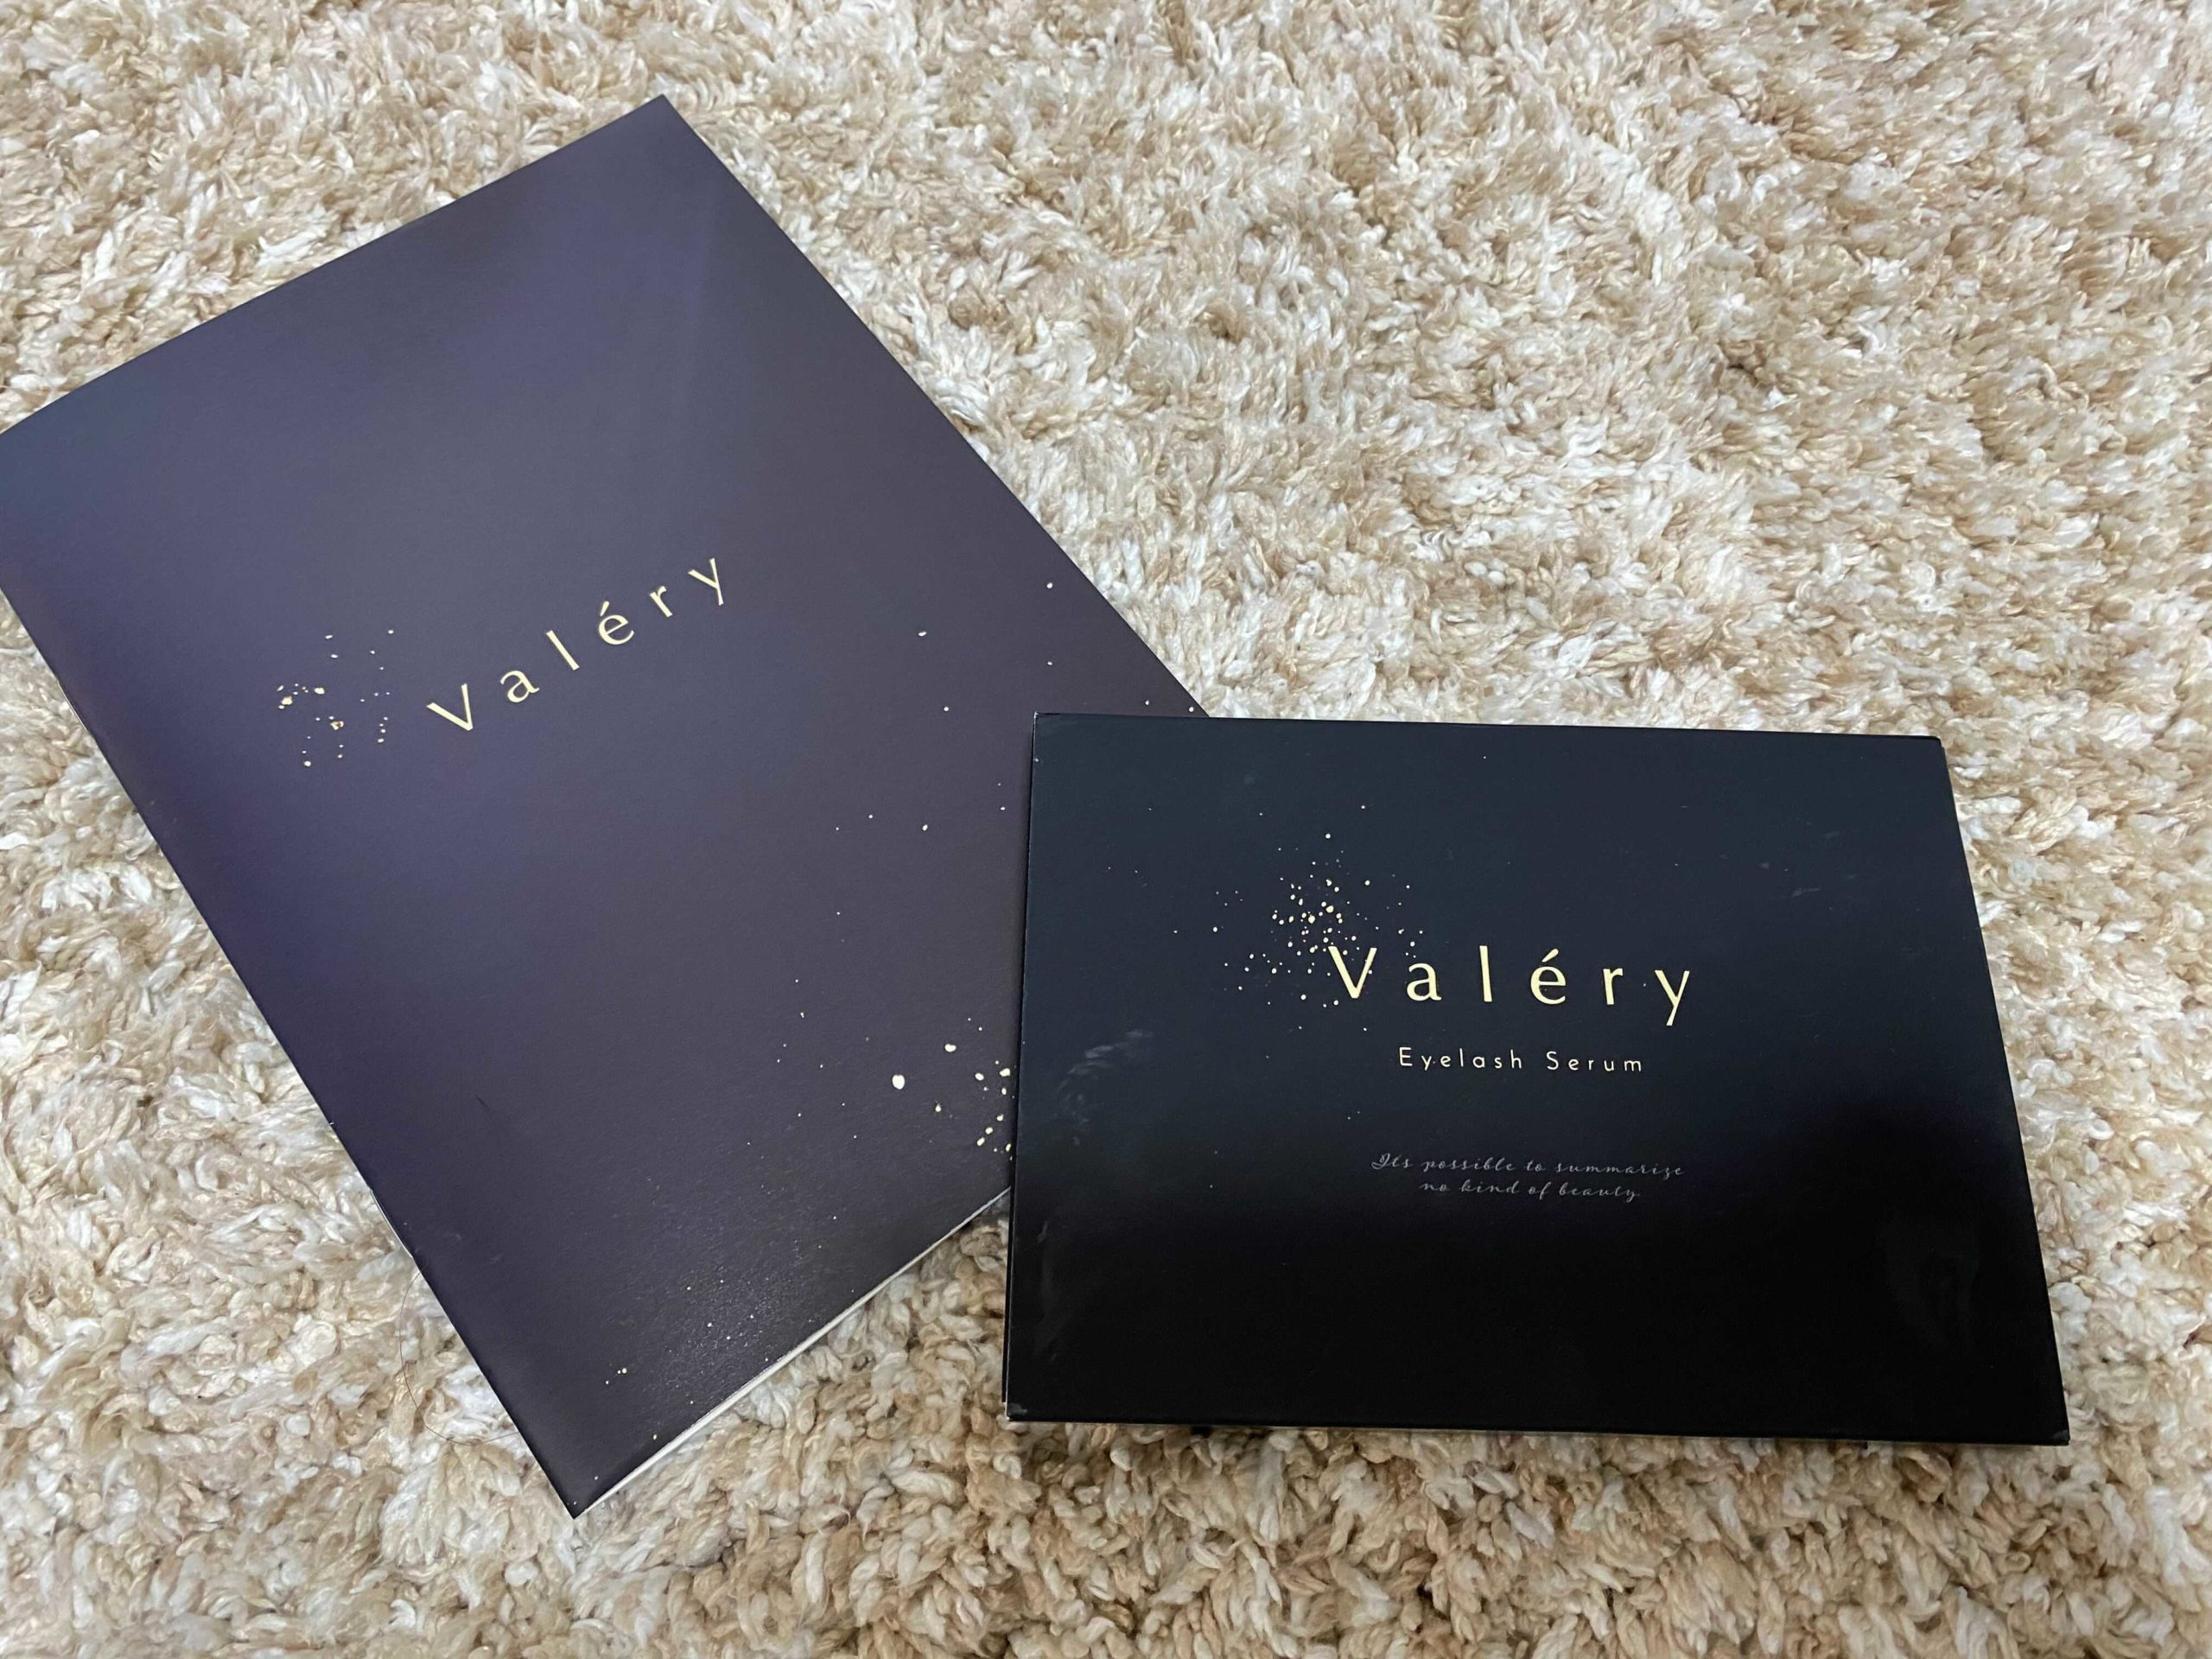 Valery(ヴァレリー)まつげ美容液,最安値